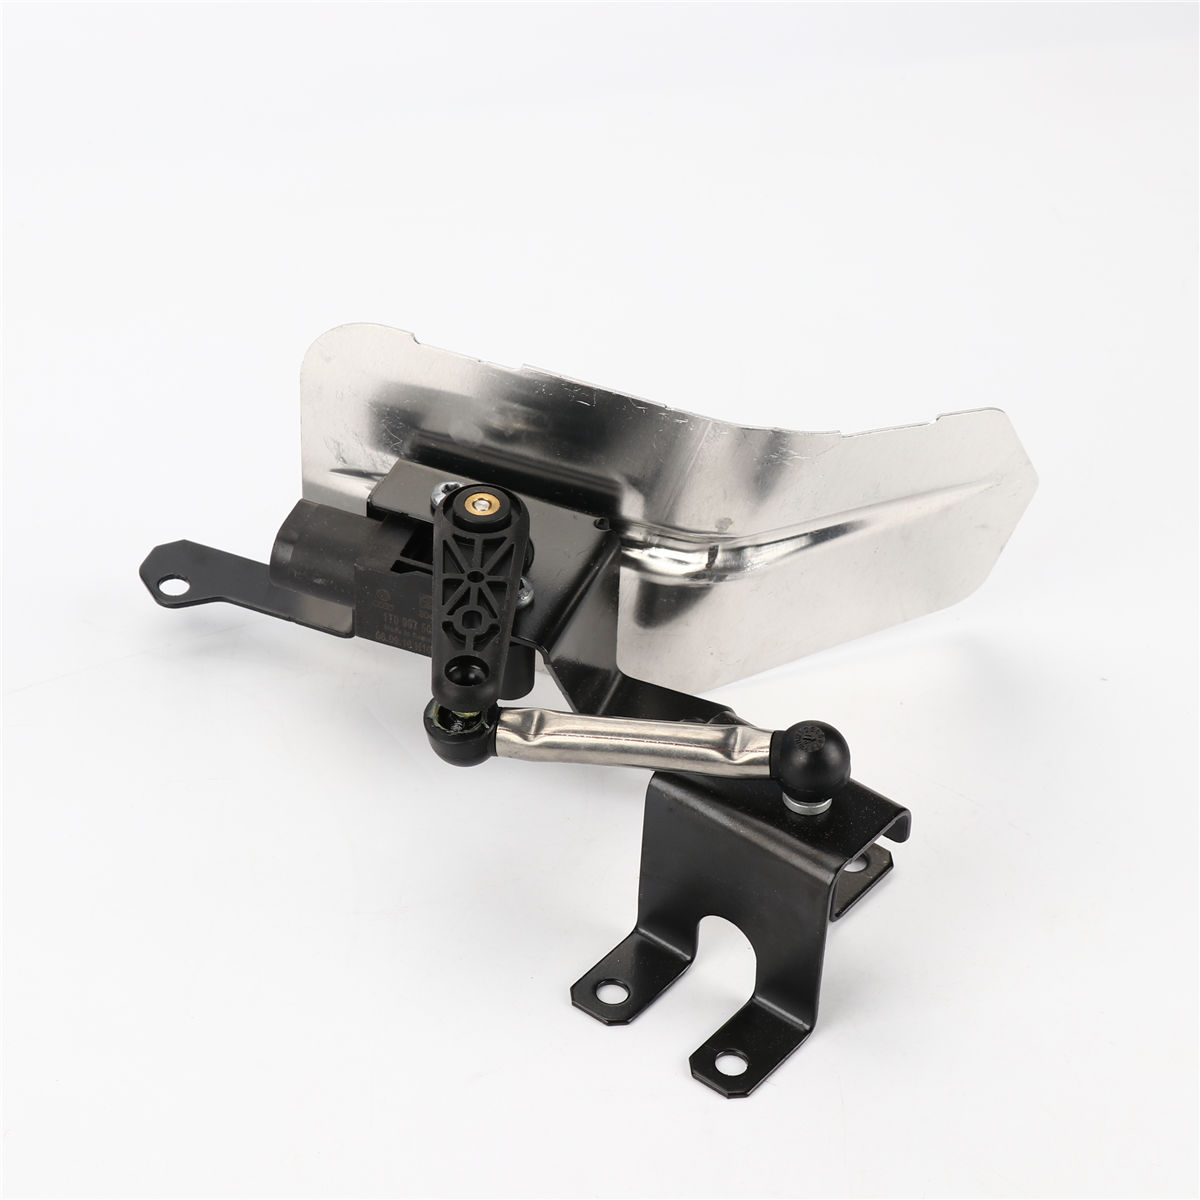 1pcs New Headlight Level Sensor for Audi TT Q3 A3 Seat Leon VW Golf Touran 1K0 941 273 N high quality 3c907503 4h0941286g 4h0941285g headlight level sensor for audi c6